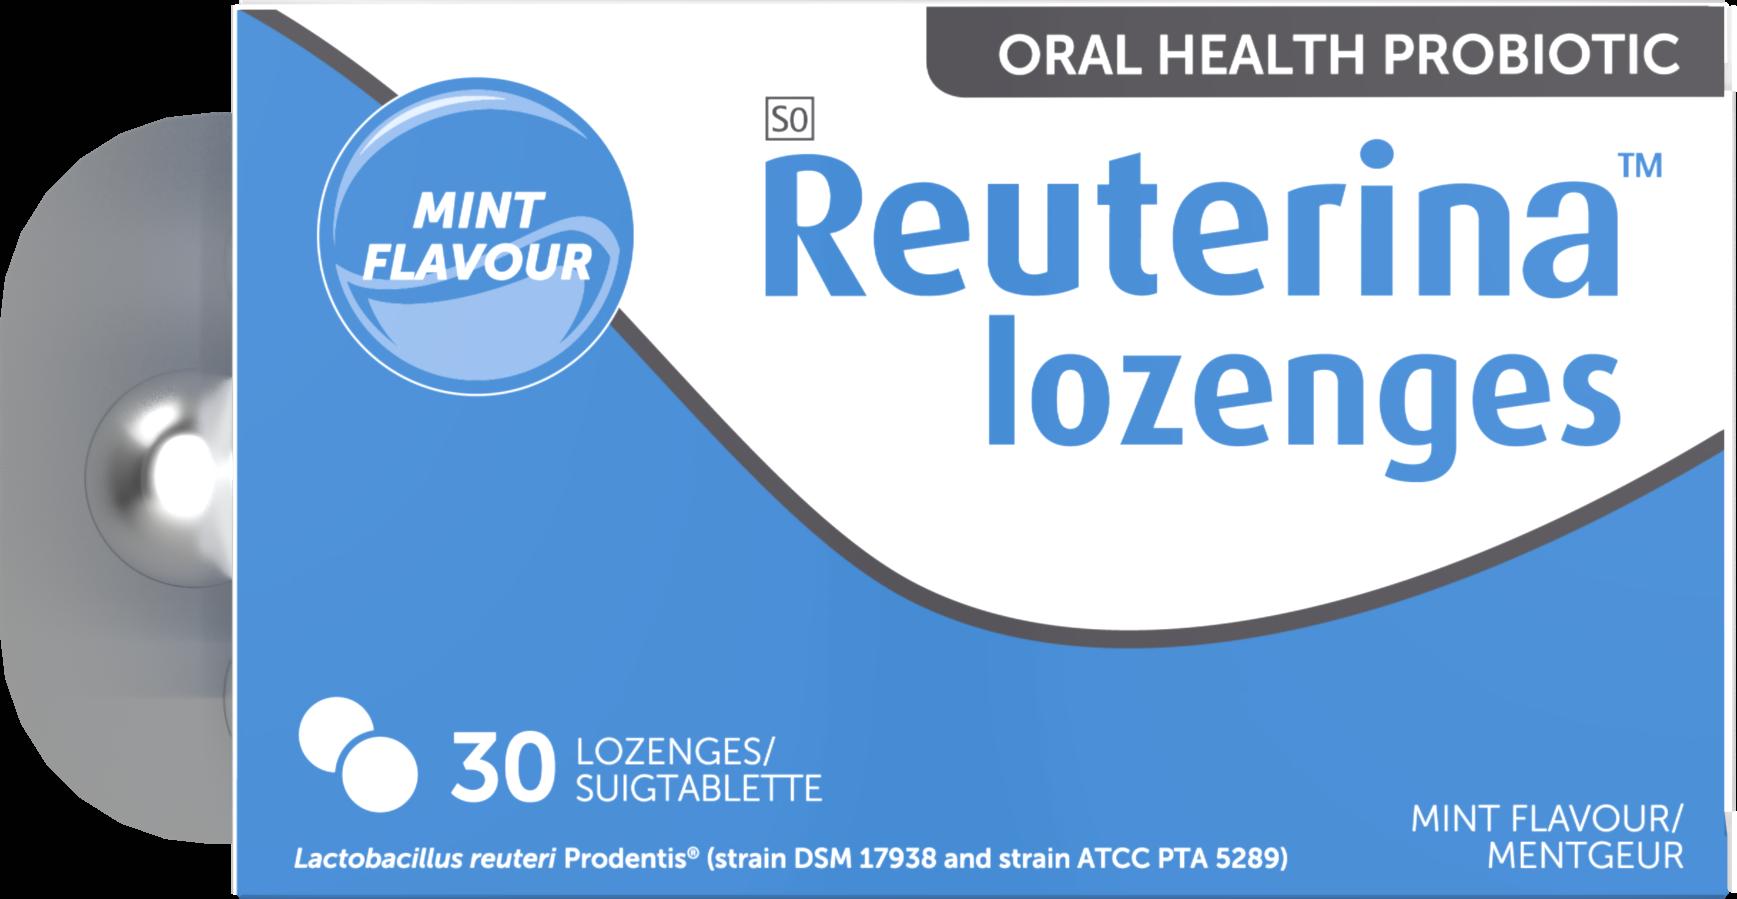 Reuterina Lozenges probiotic